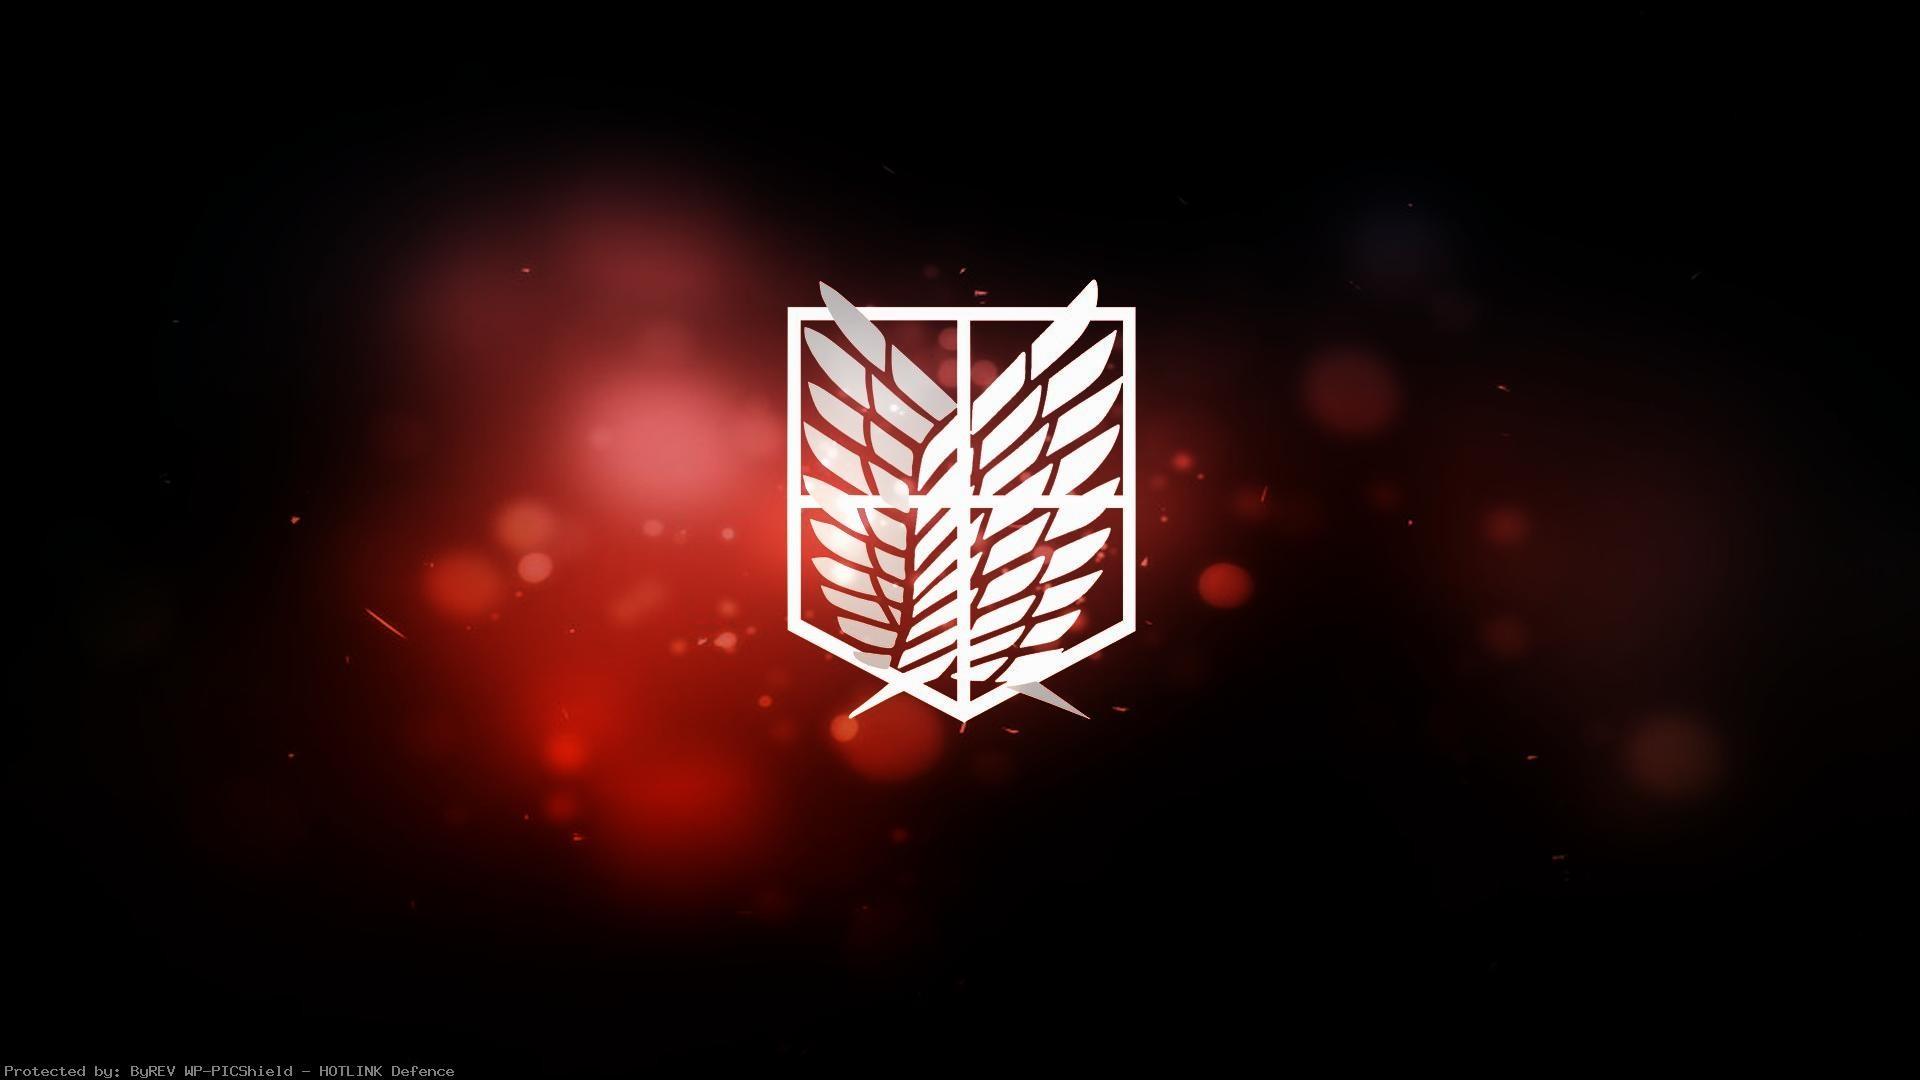 Anime-Attack-On-Titan-Emblem-Scouting-Legion-wallpaper-